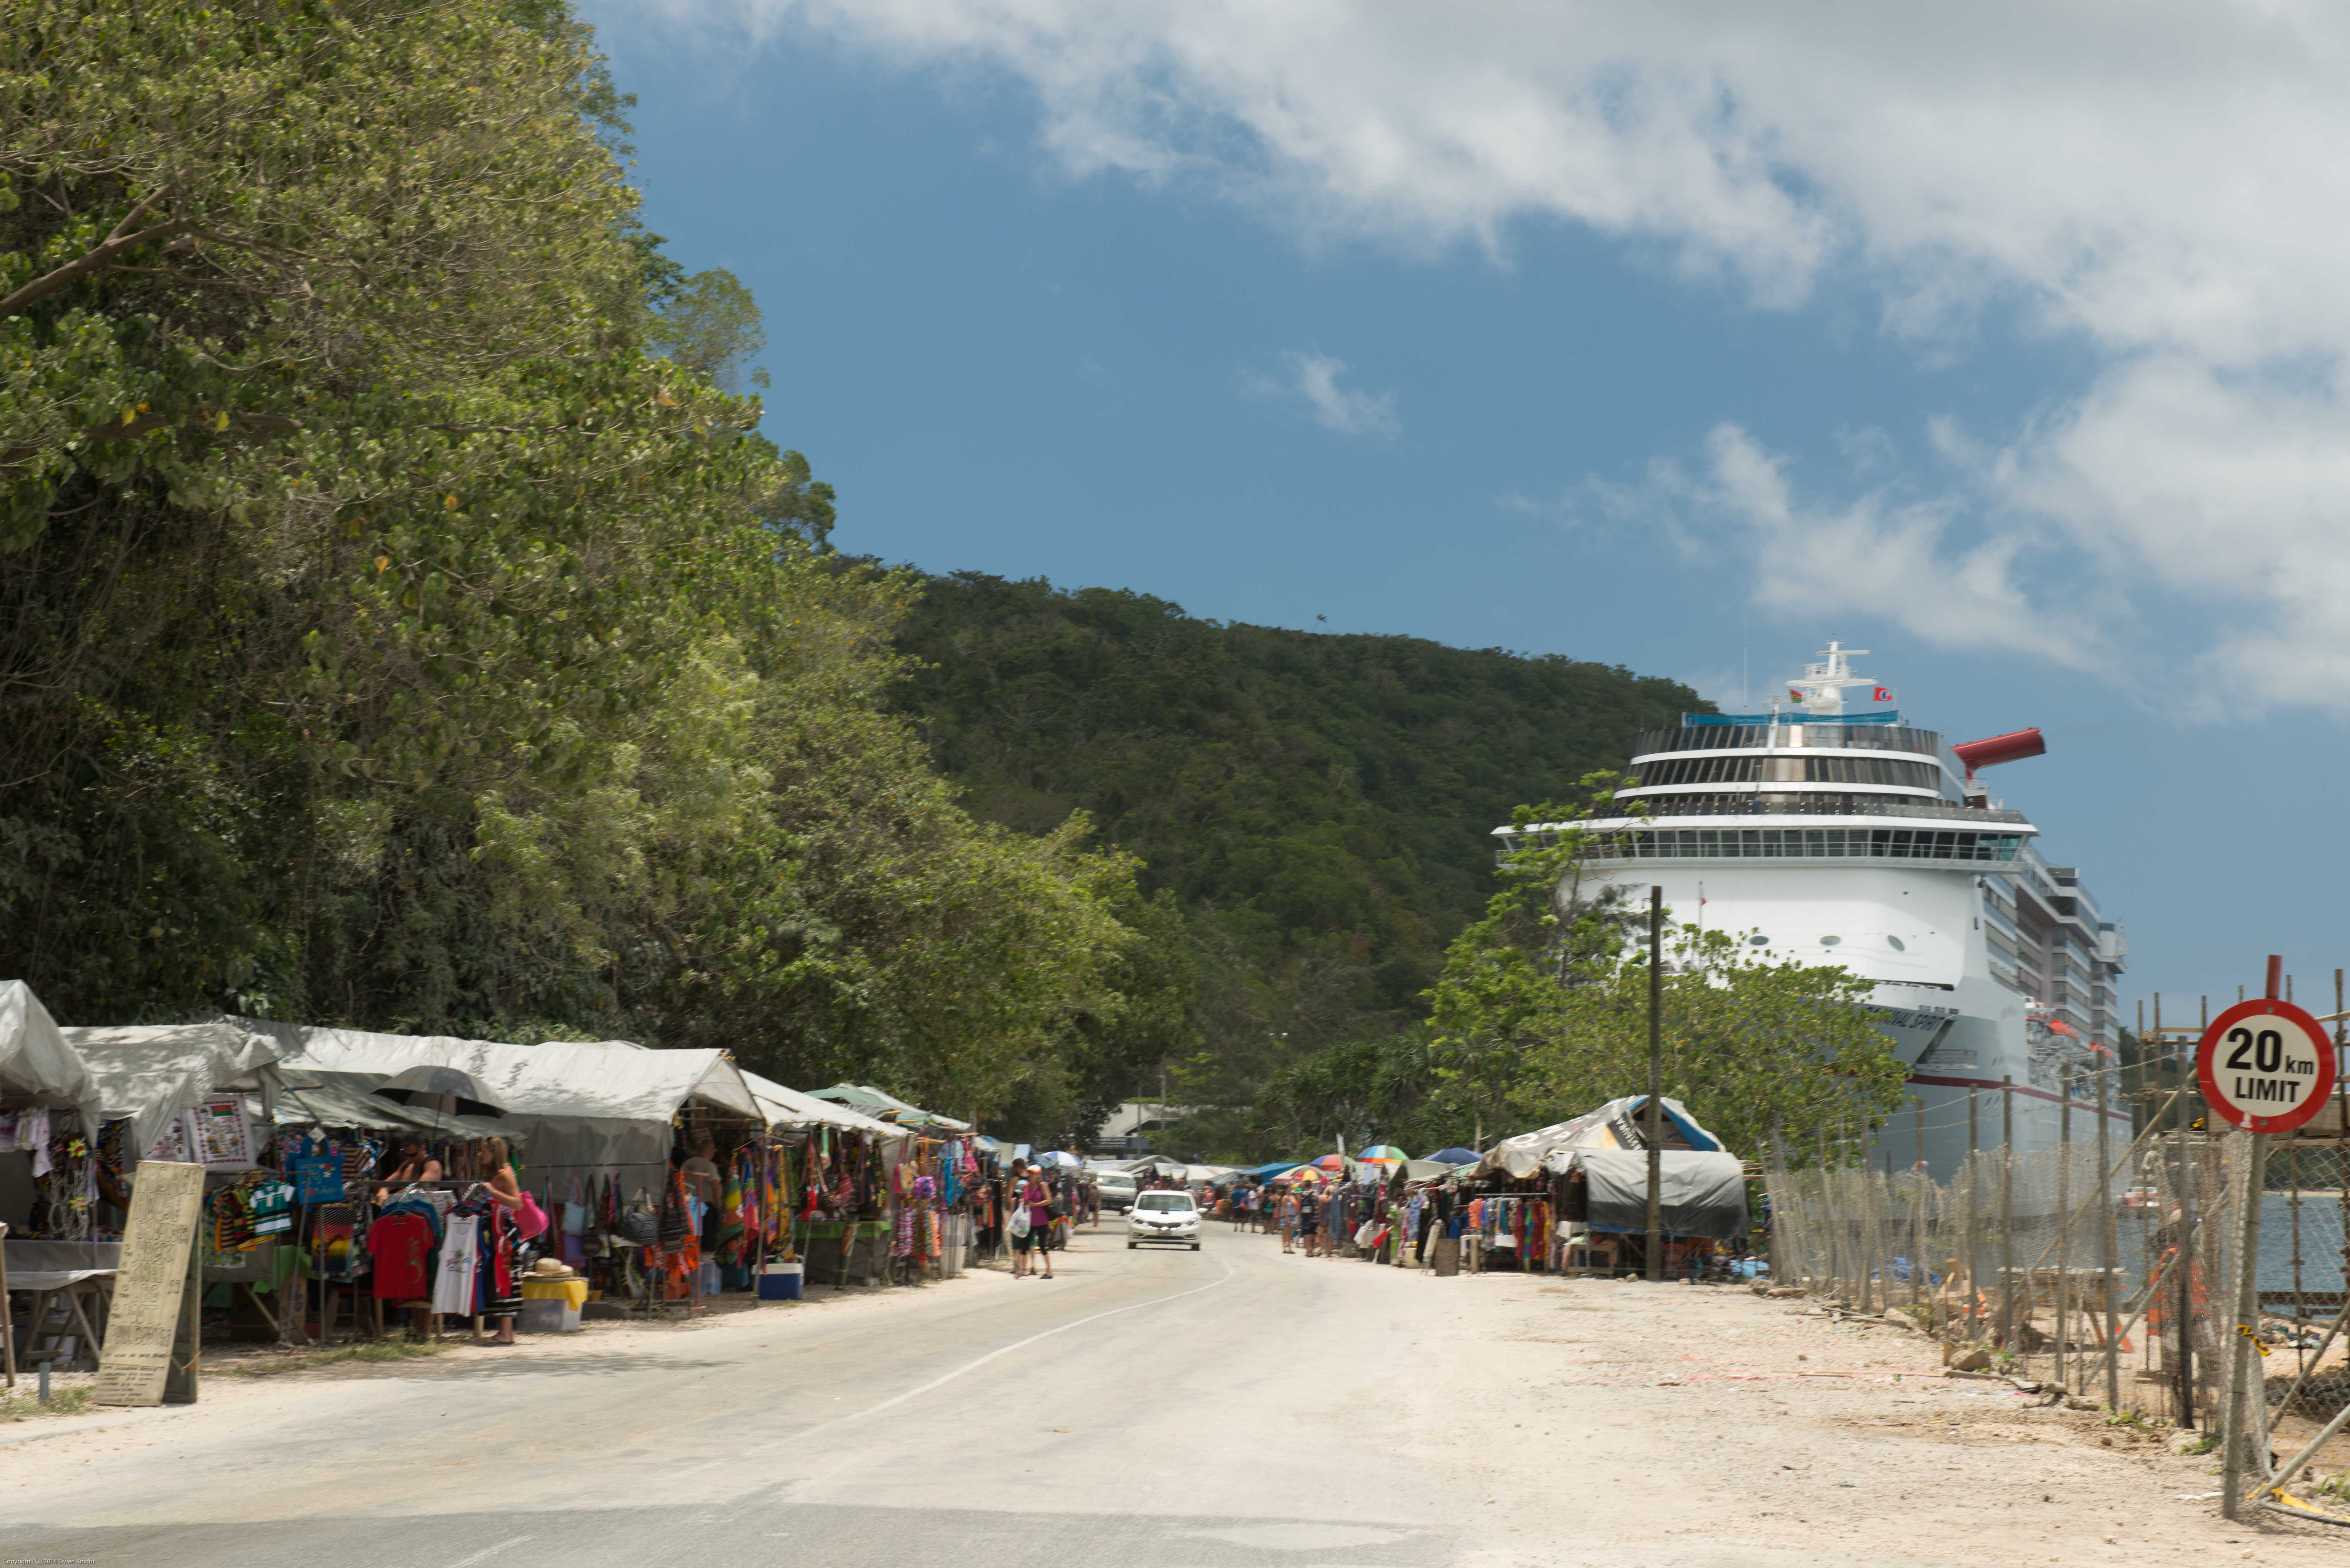 Scenes from Daily Life: Port Vila, Vanuatu